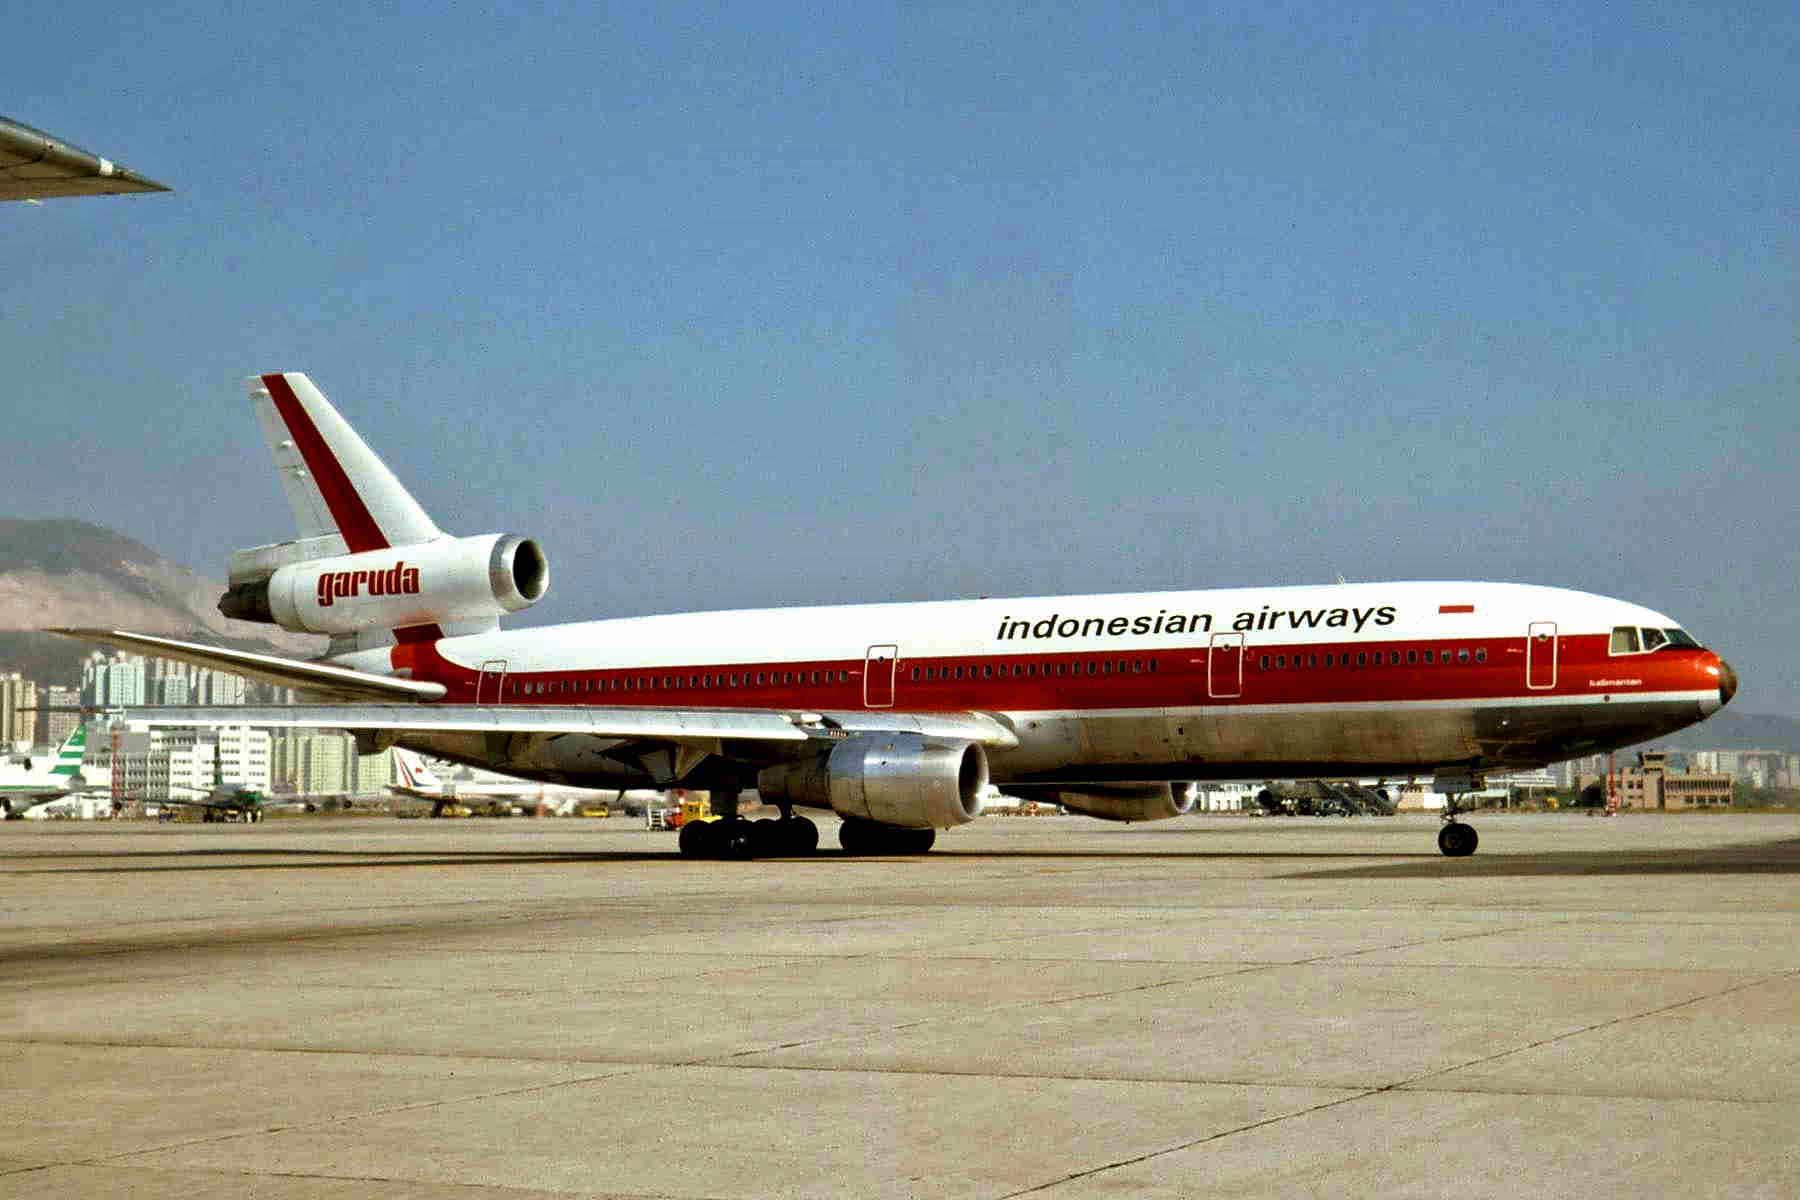 Garuda indonesia flight 865 wikipedia pk gie dc 10 30 garuda hkg 27oct81 5635737289g stopboris Choice Image